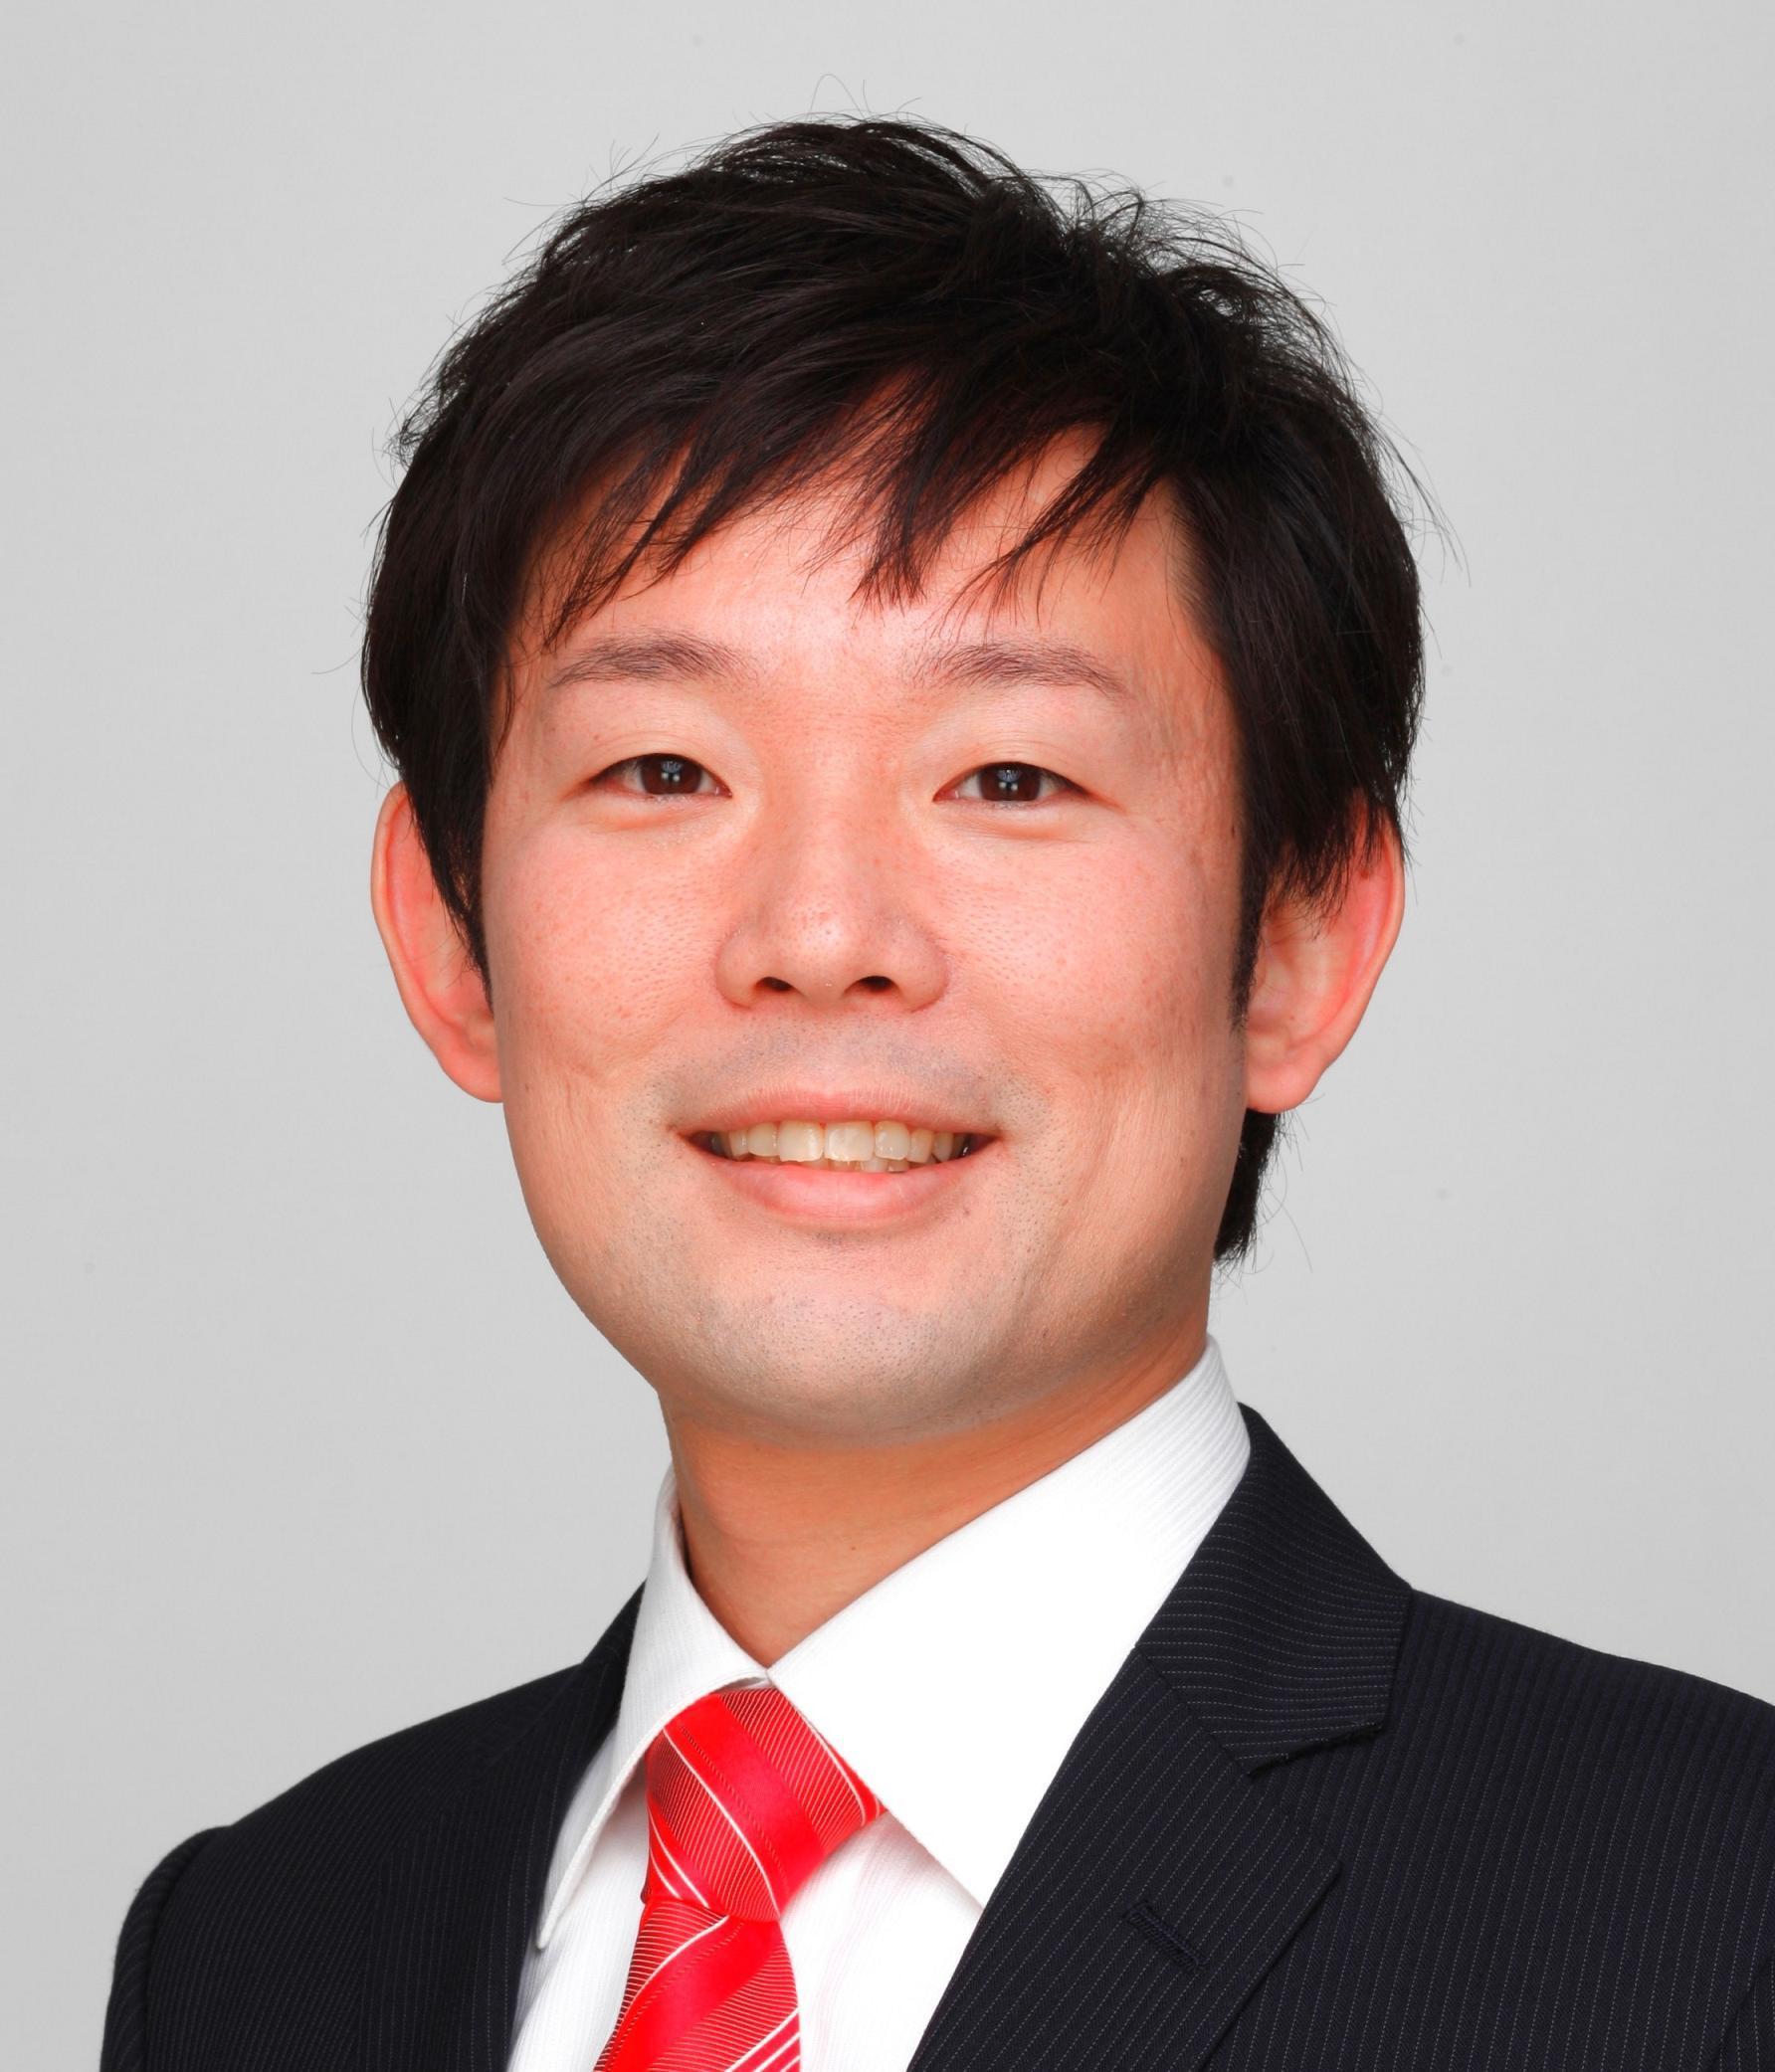 https://stat.profile.ameba.jp/profile_images/20130224/00/74/d1/j/o178420831361634098711.jpg